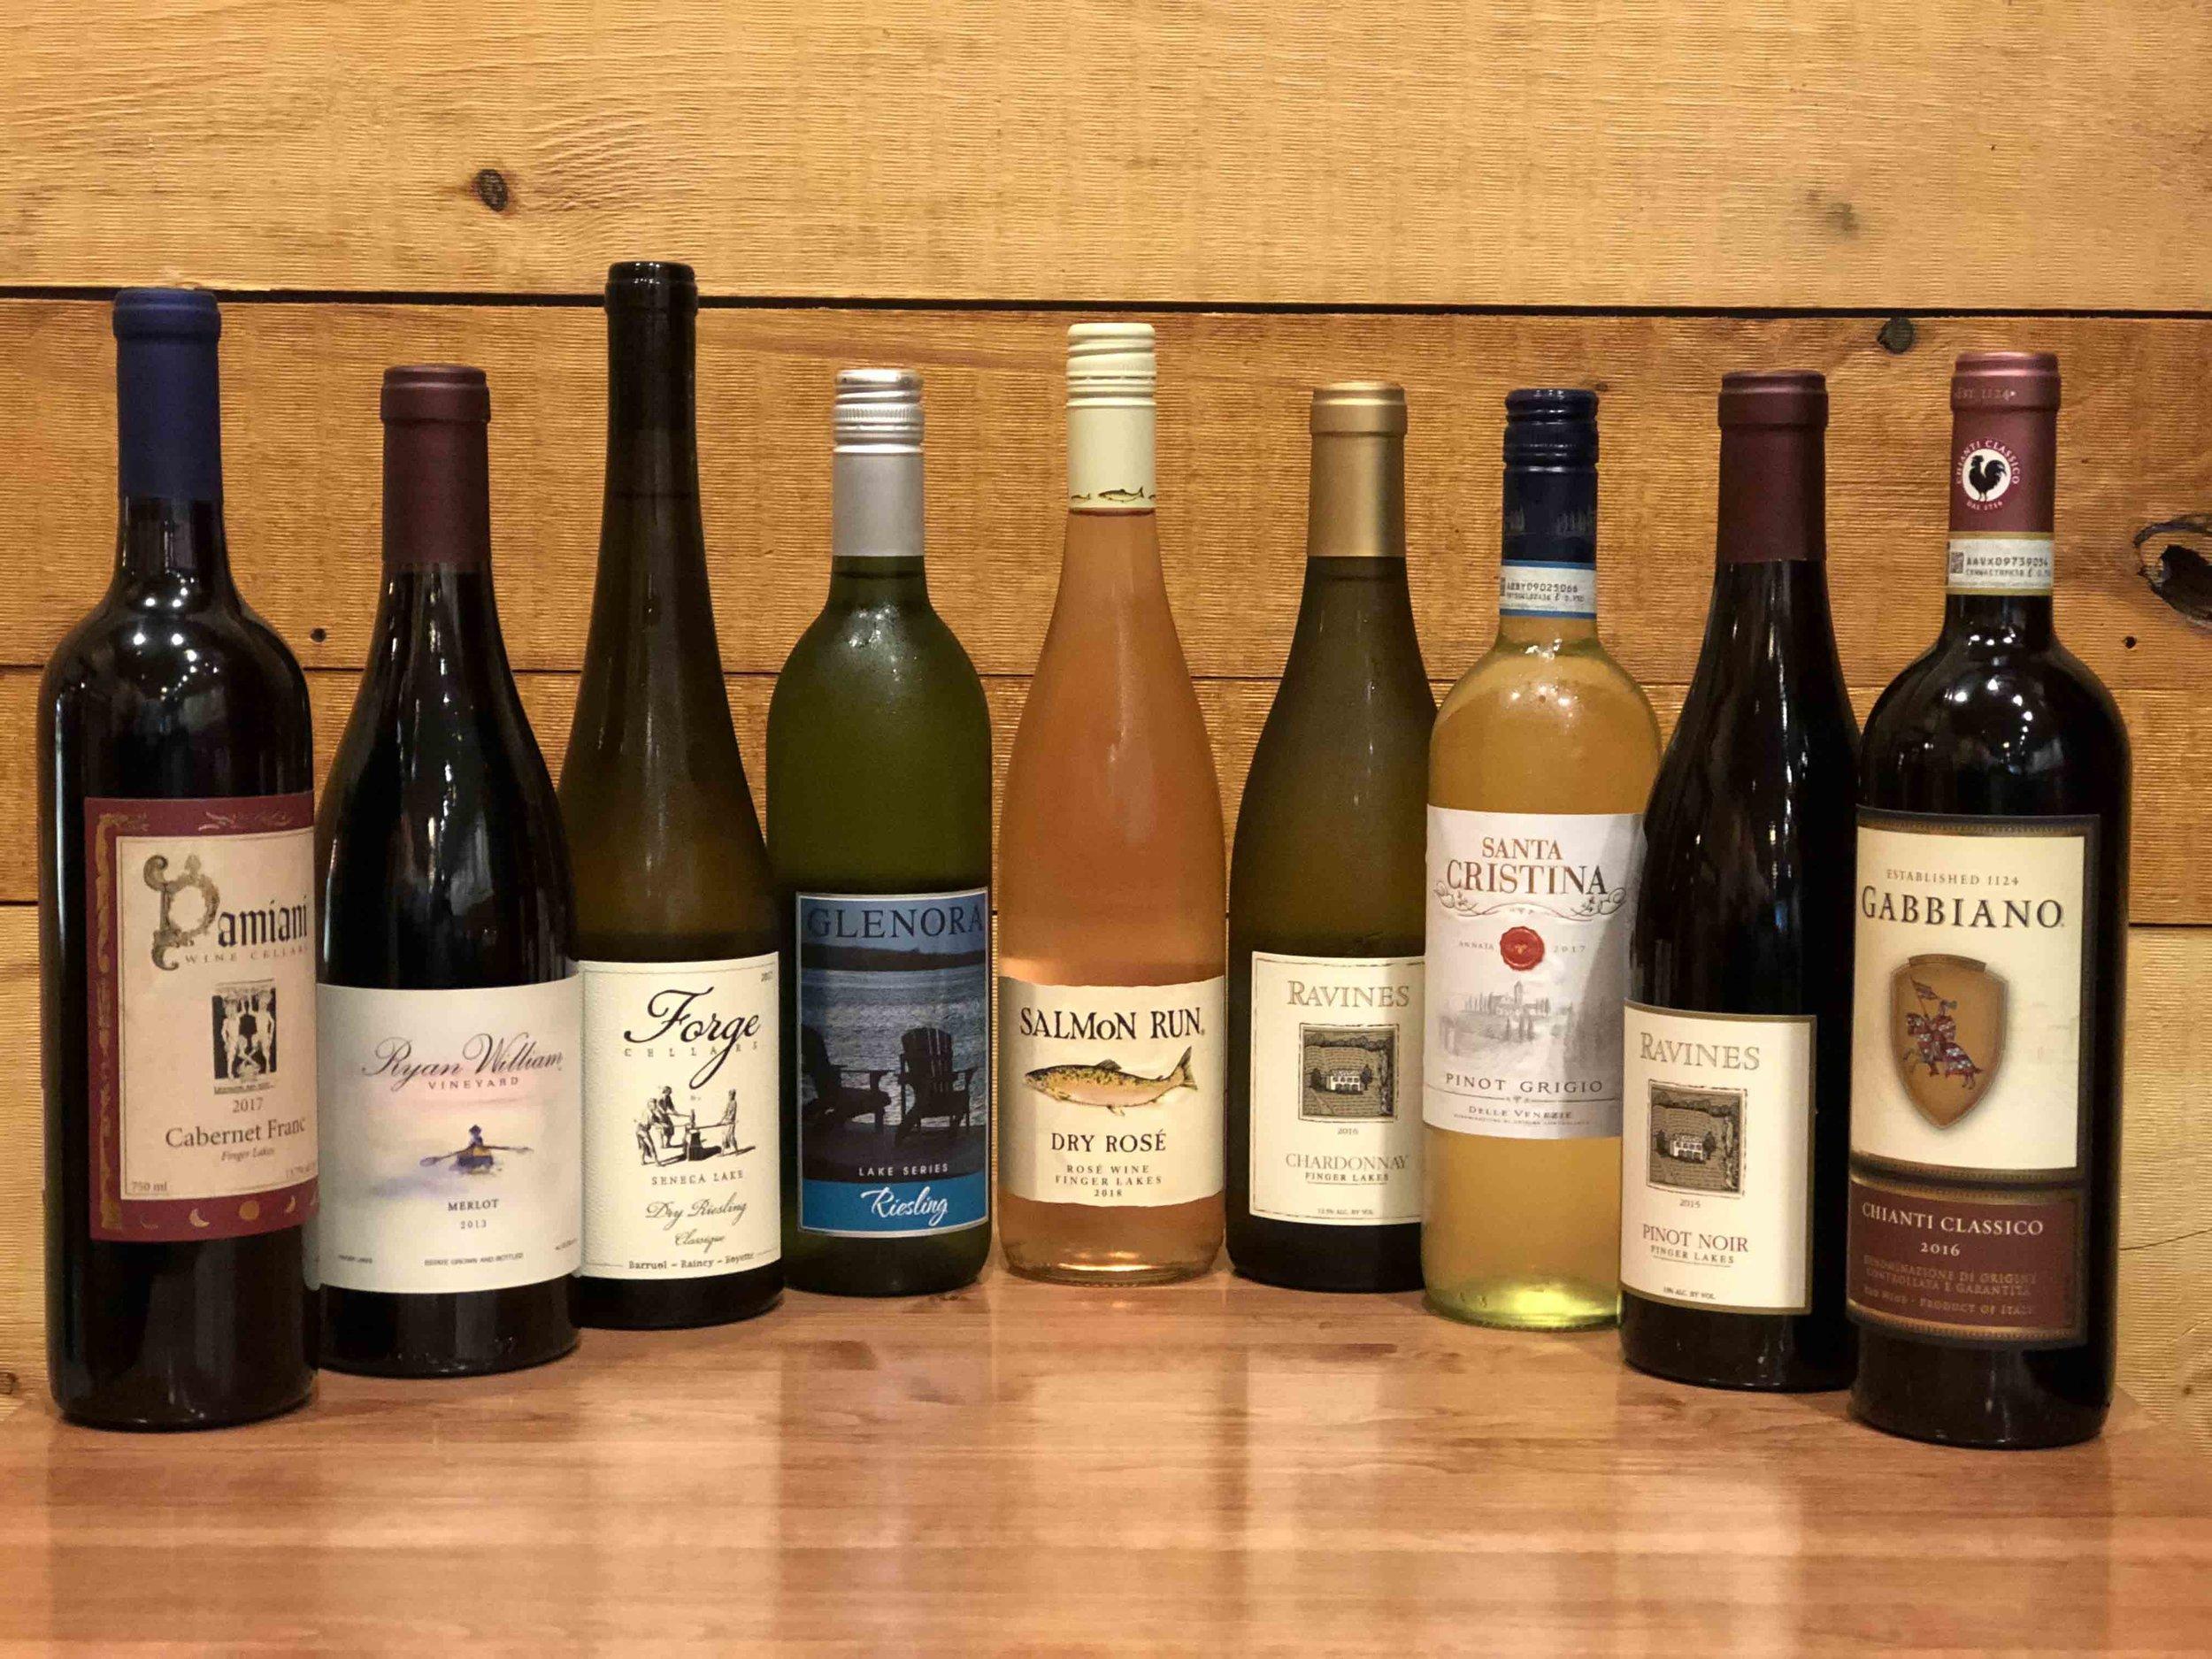 wines by glass.jpg